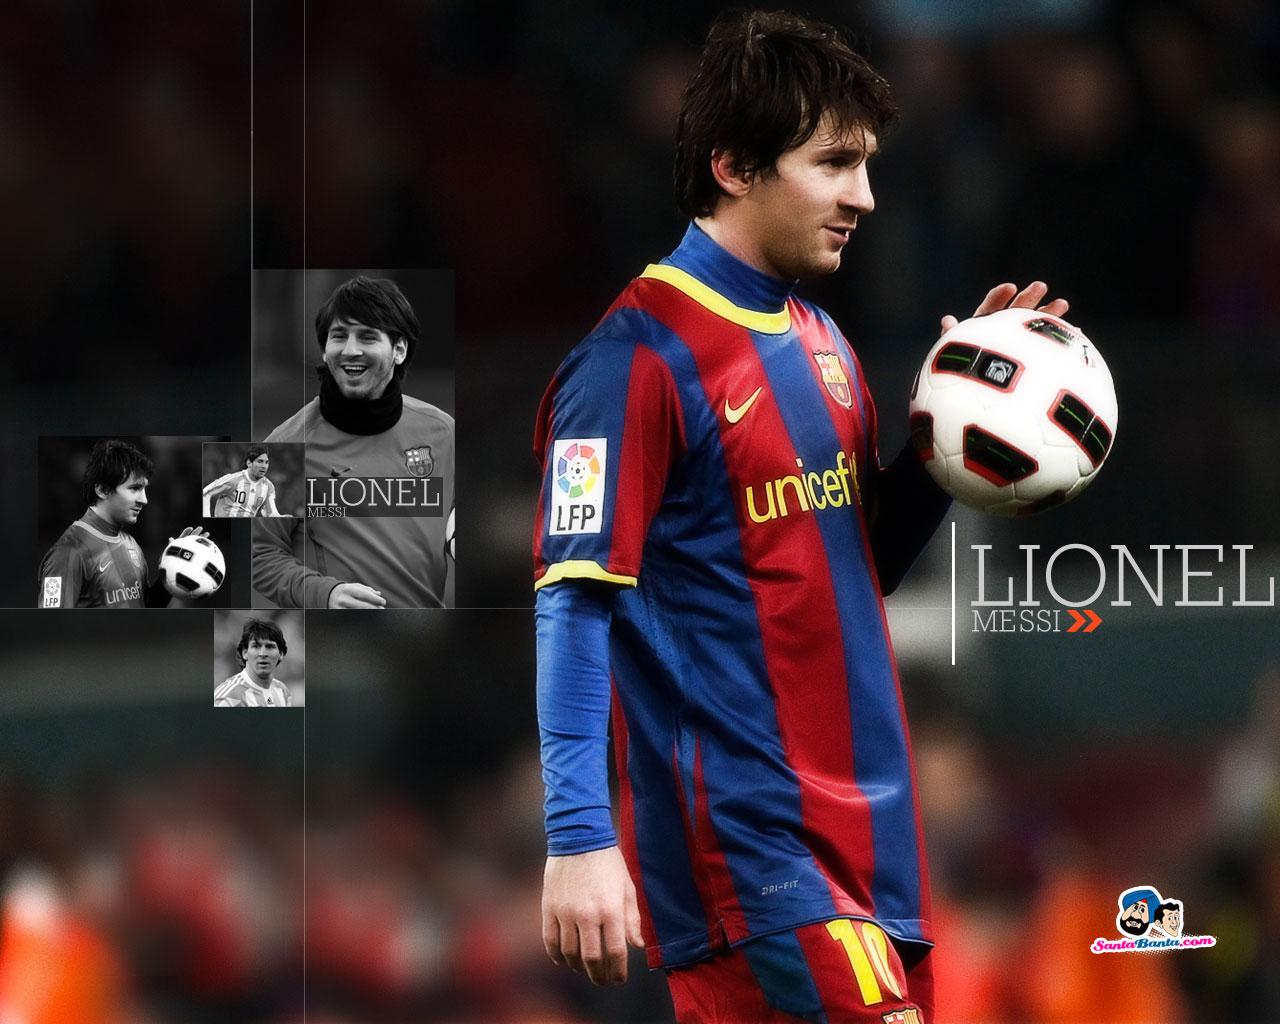 http://2.bp.blogspot.com/-gJ-YnPzNvw8/ULflKumt9PI/AAAAAAAAAAU/hKl44gtWj1Y/s1600/Lionel+Messi+1.jpg